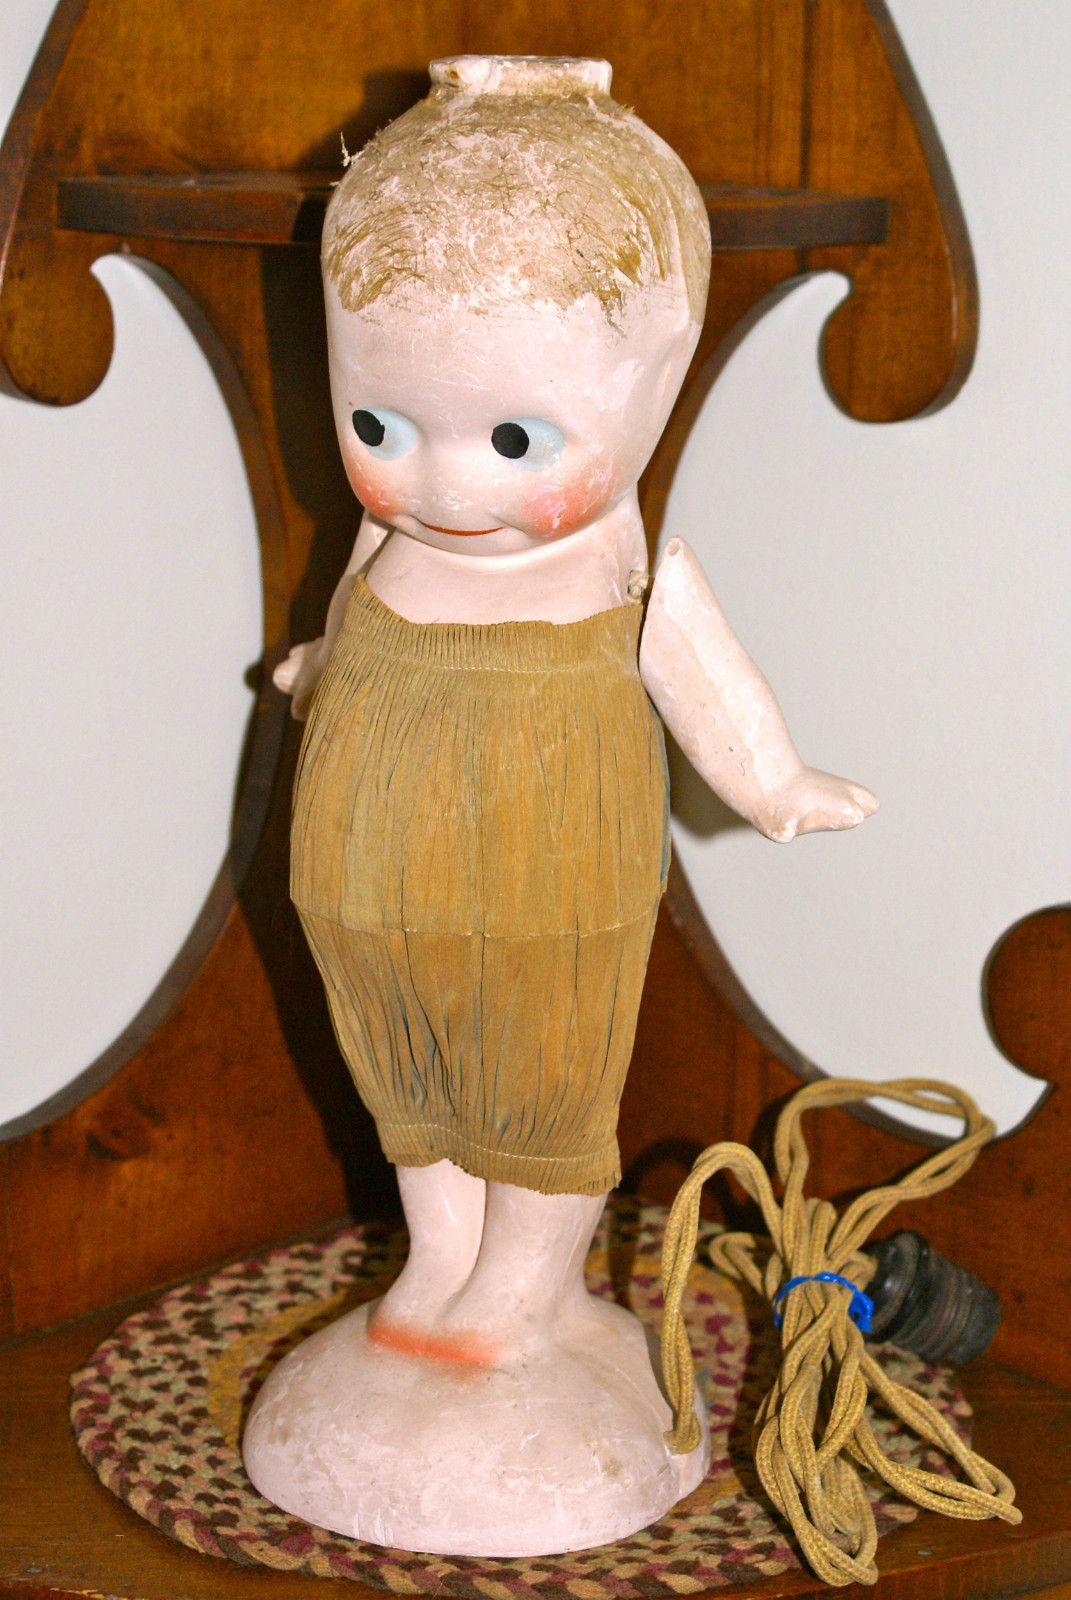 RARE 1920's Chalkware Kewpie Doll Lamp 13 5 inches Tall ...